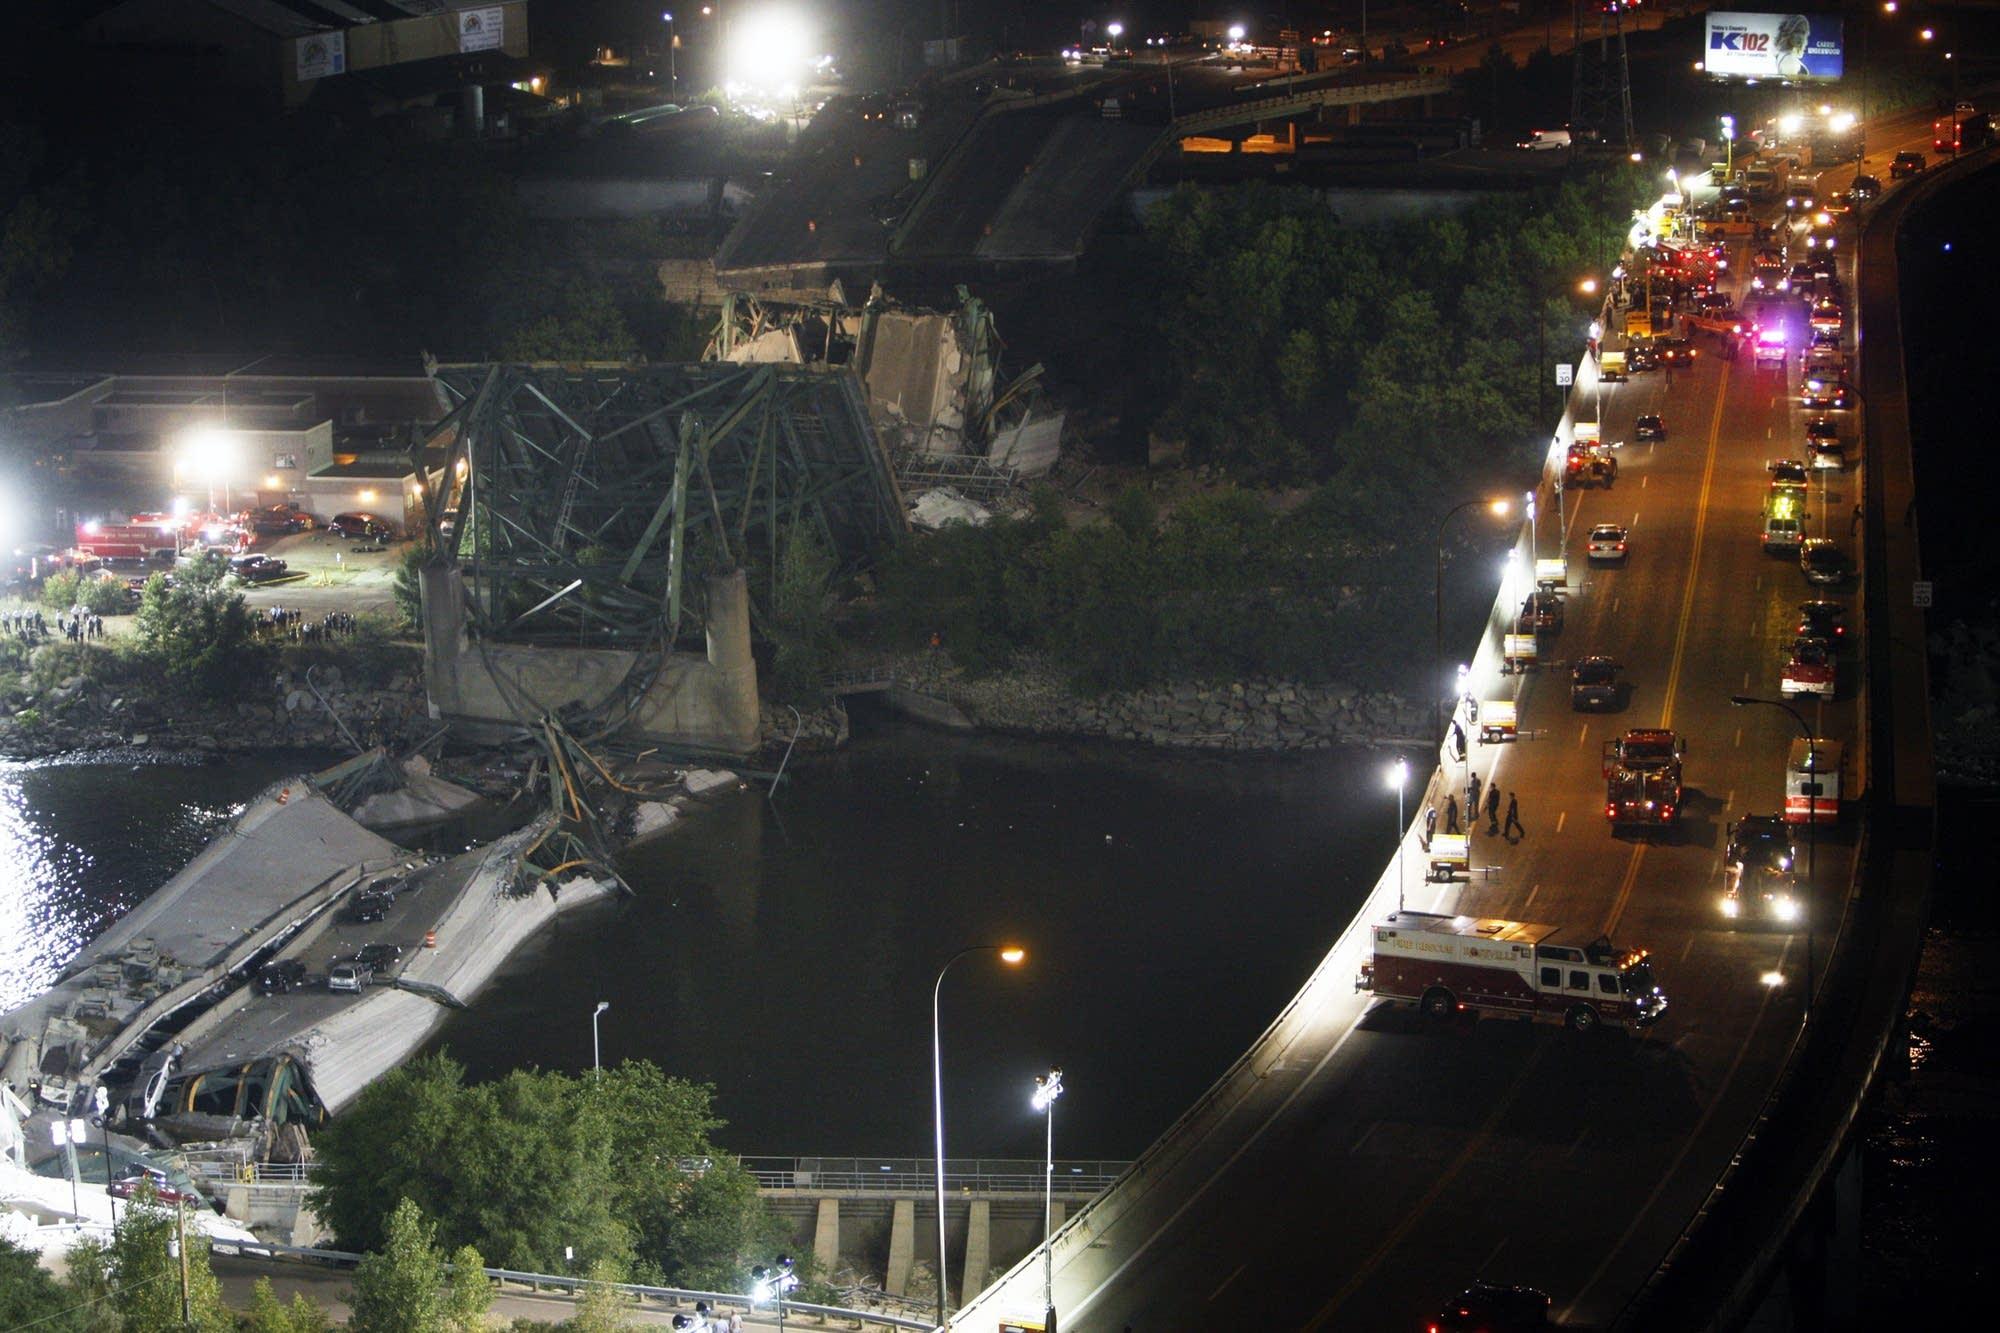 Spotlights illuminate the collapsed Interstate 35W bridge.